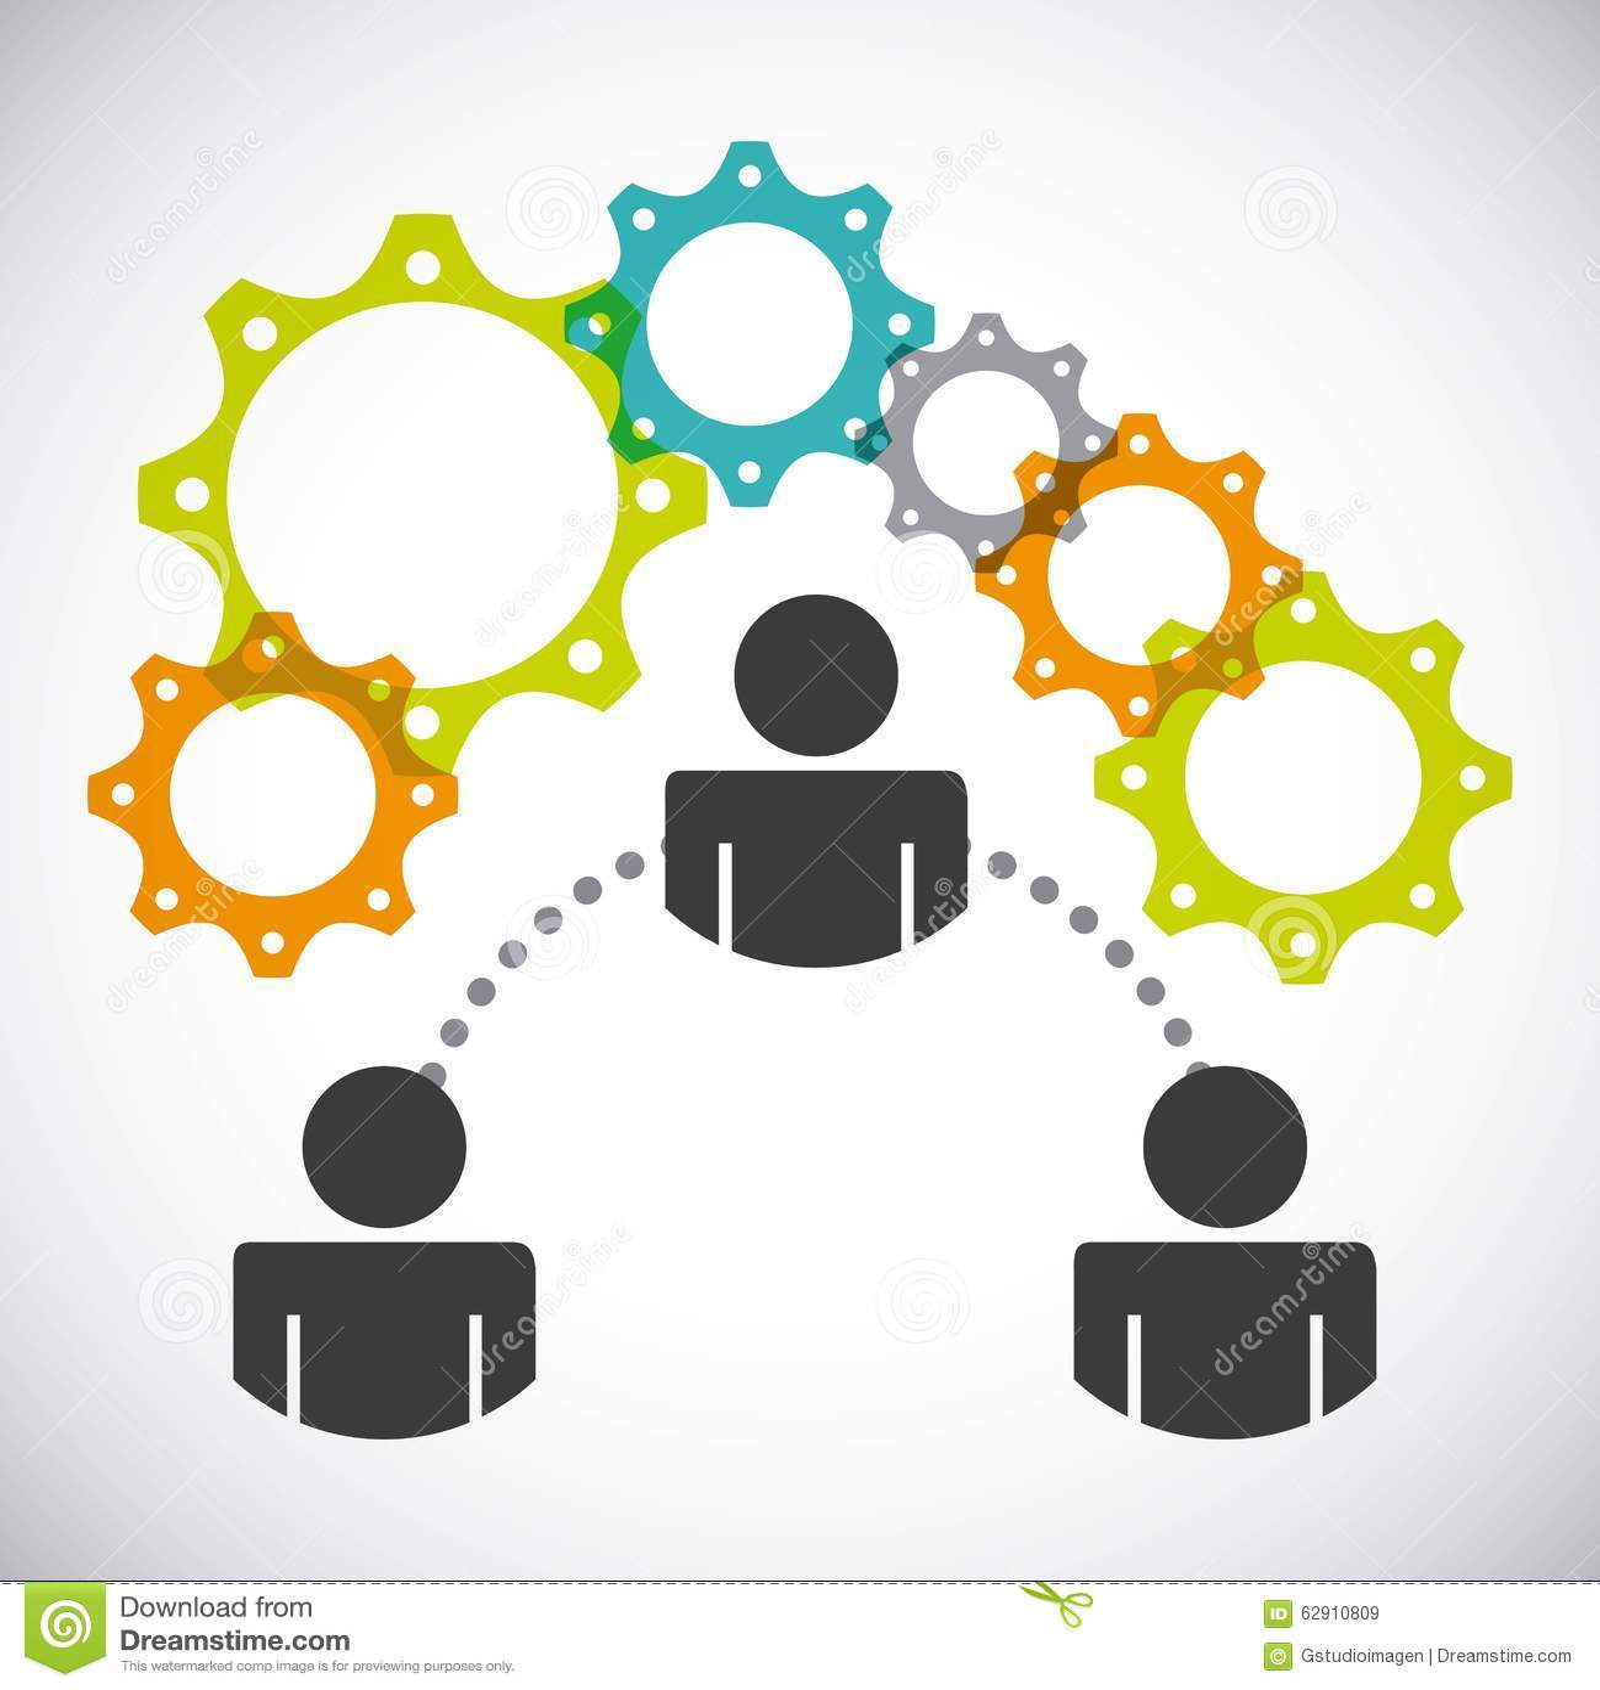 A Collaborative Design Group: Collaborative People Design Stock Vector